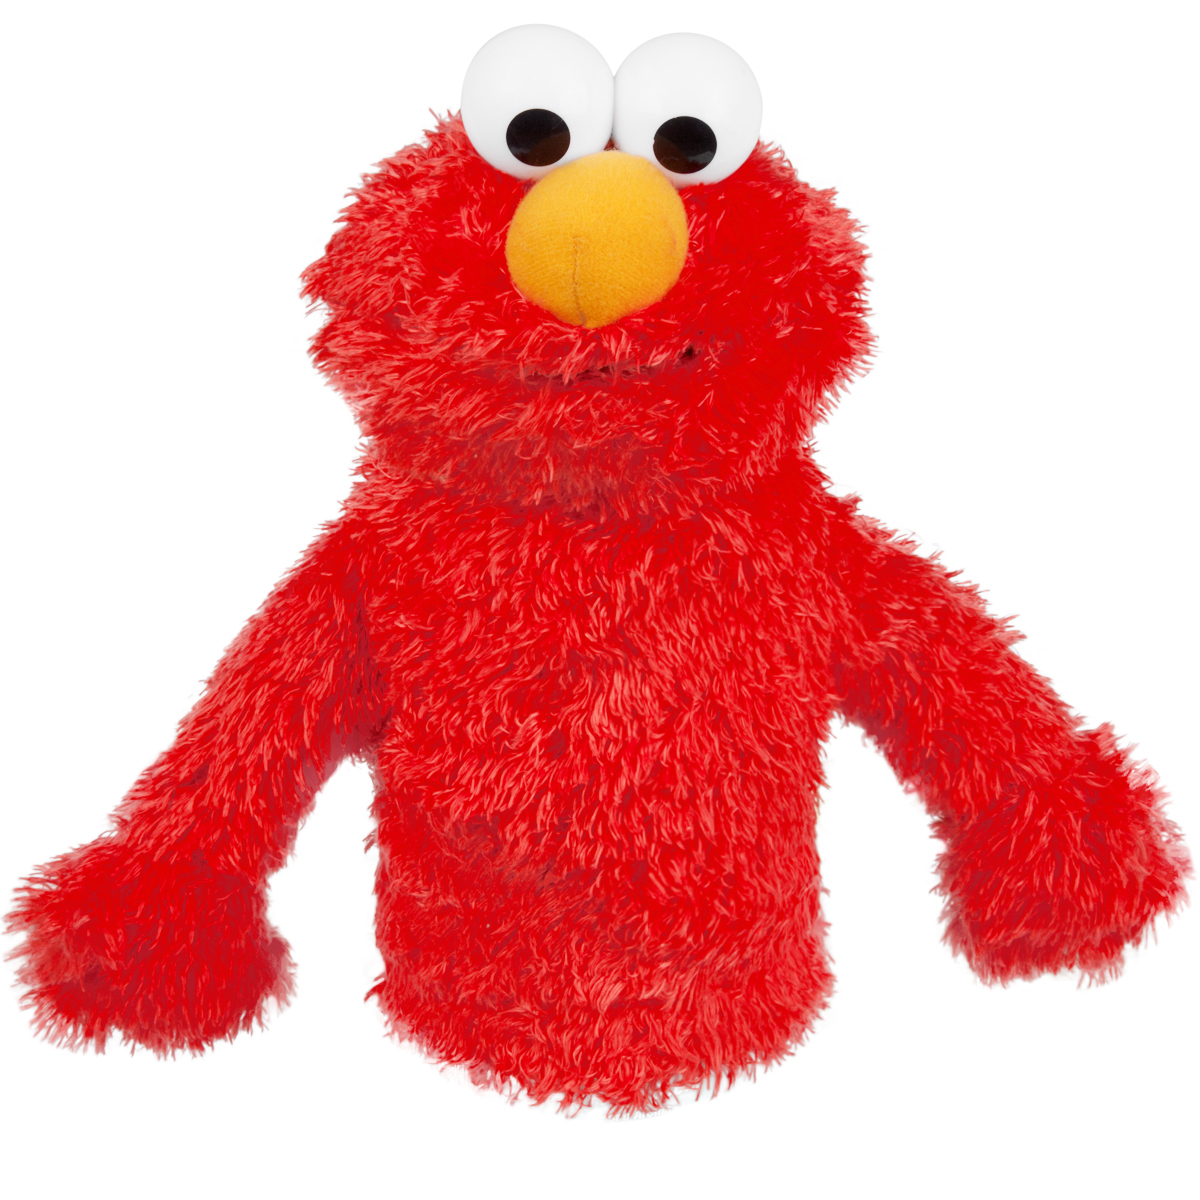 Elmo Hand Puppet